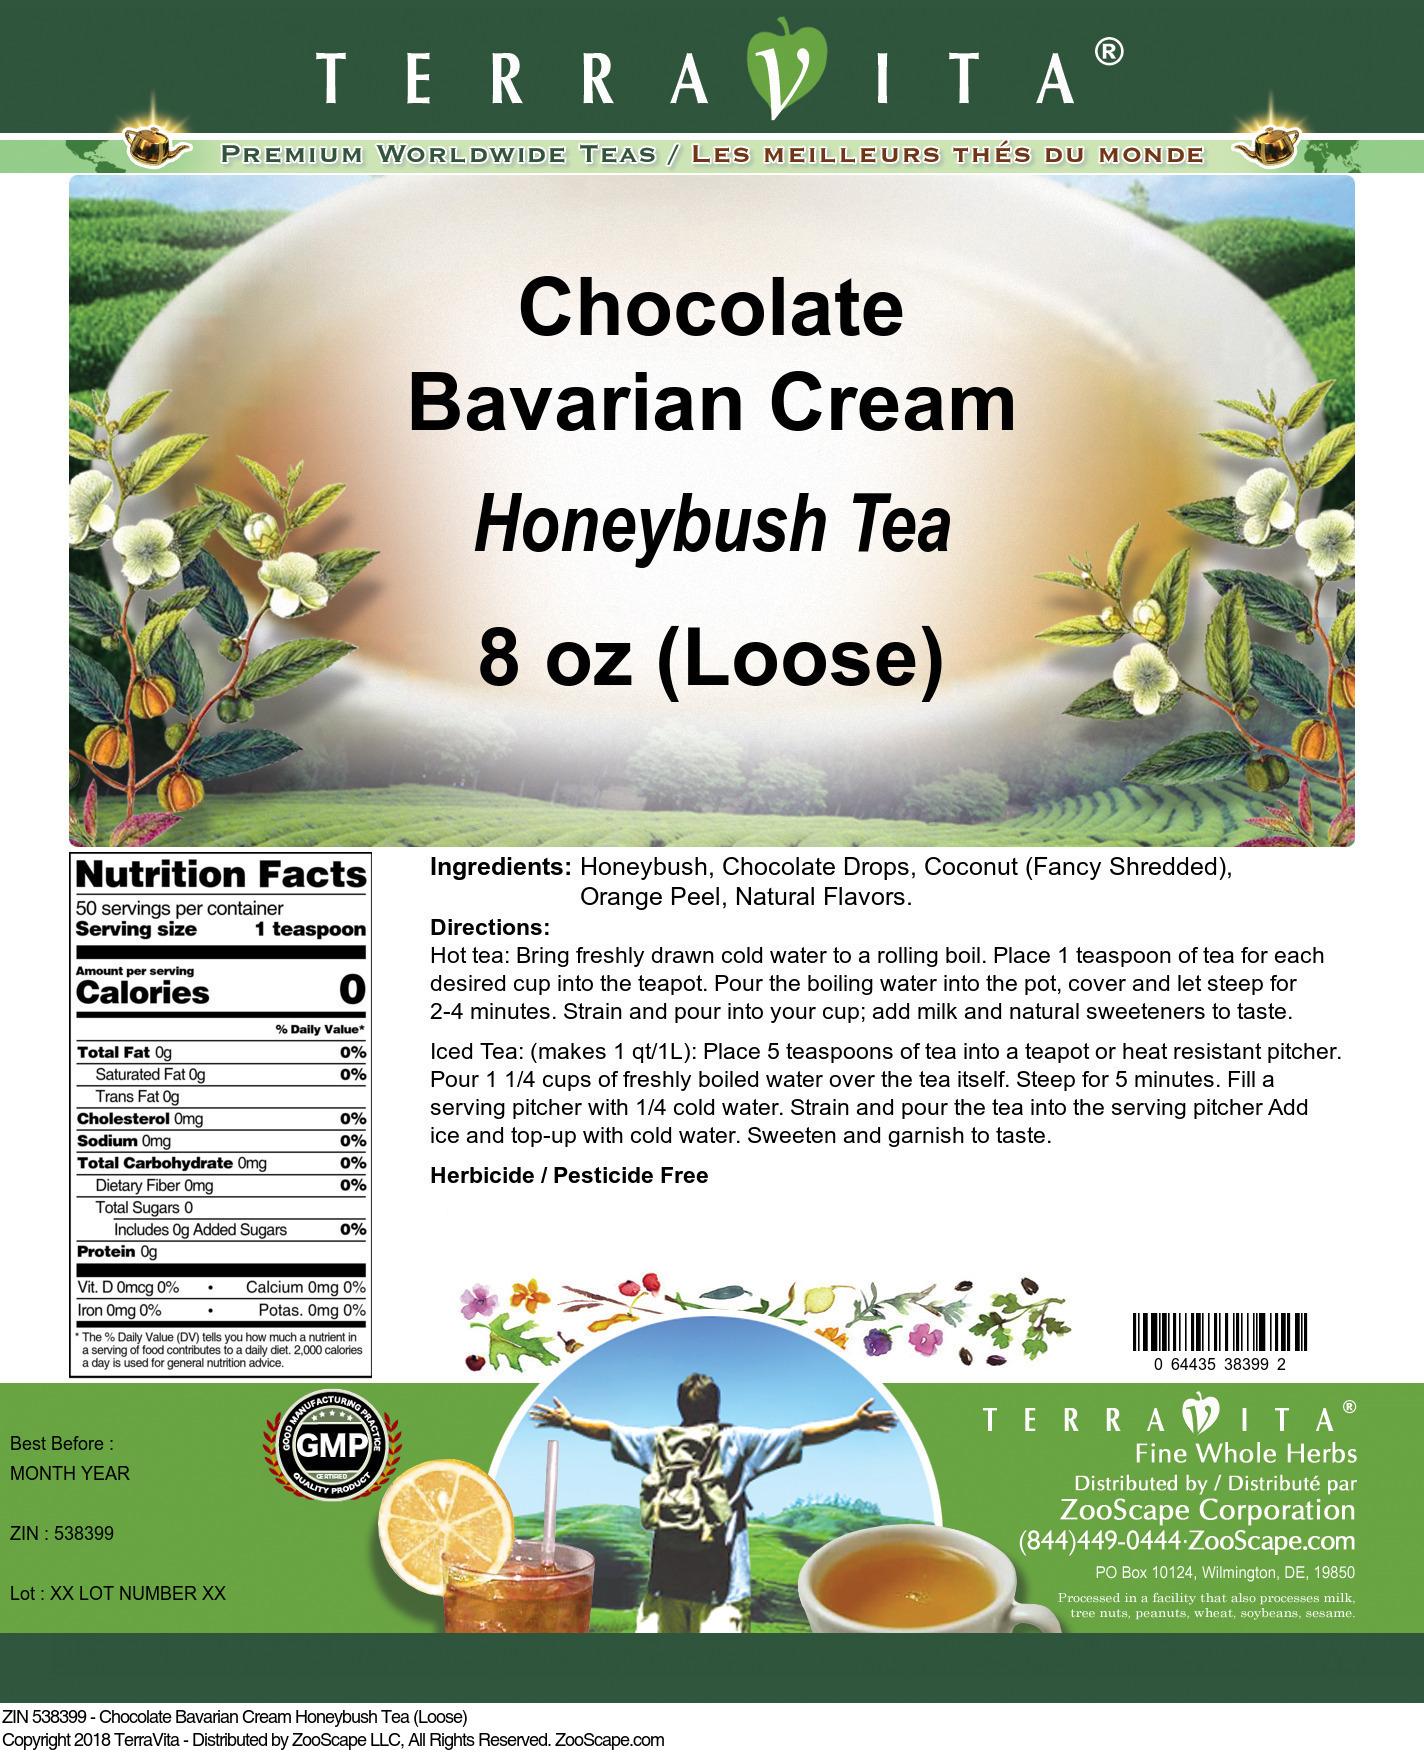 Chocolate Bavarian Cream Honeybush Tea